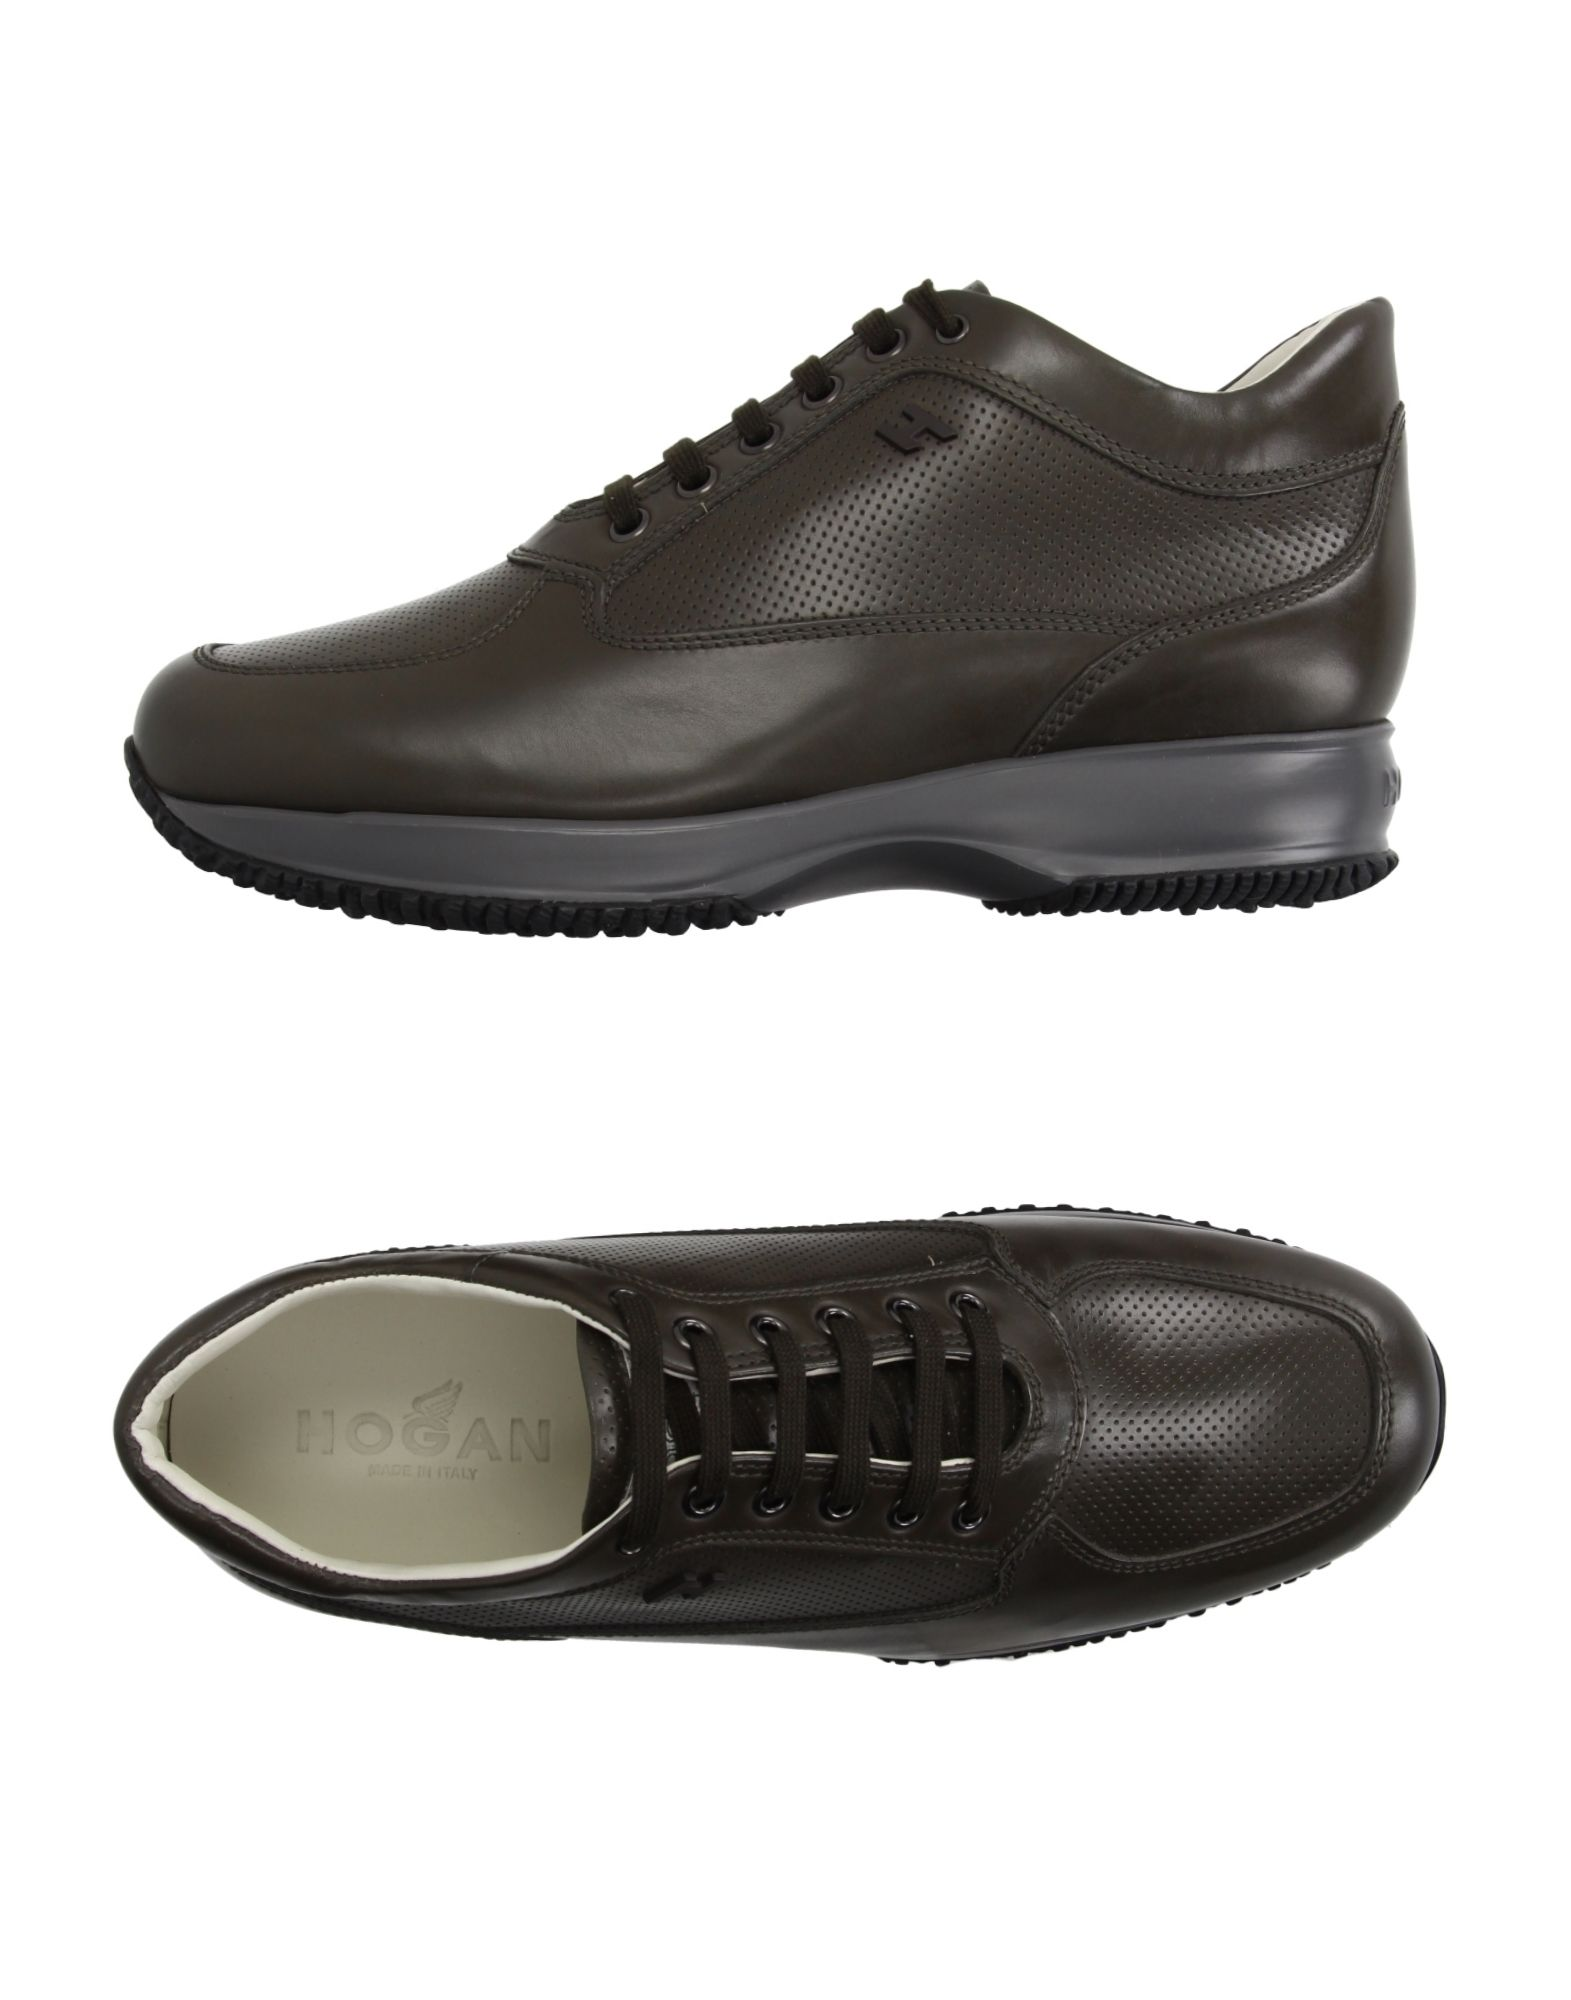 Moda Sneakers Hogan Uomo - 11178326EX